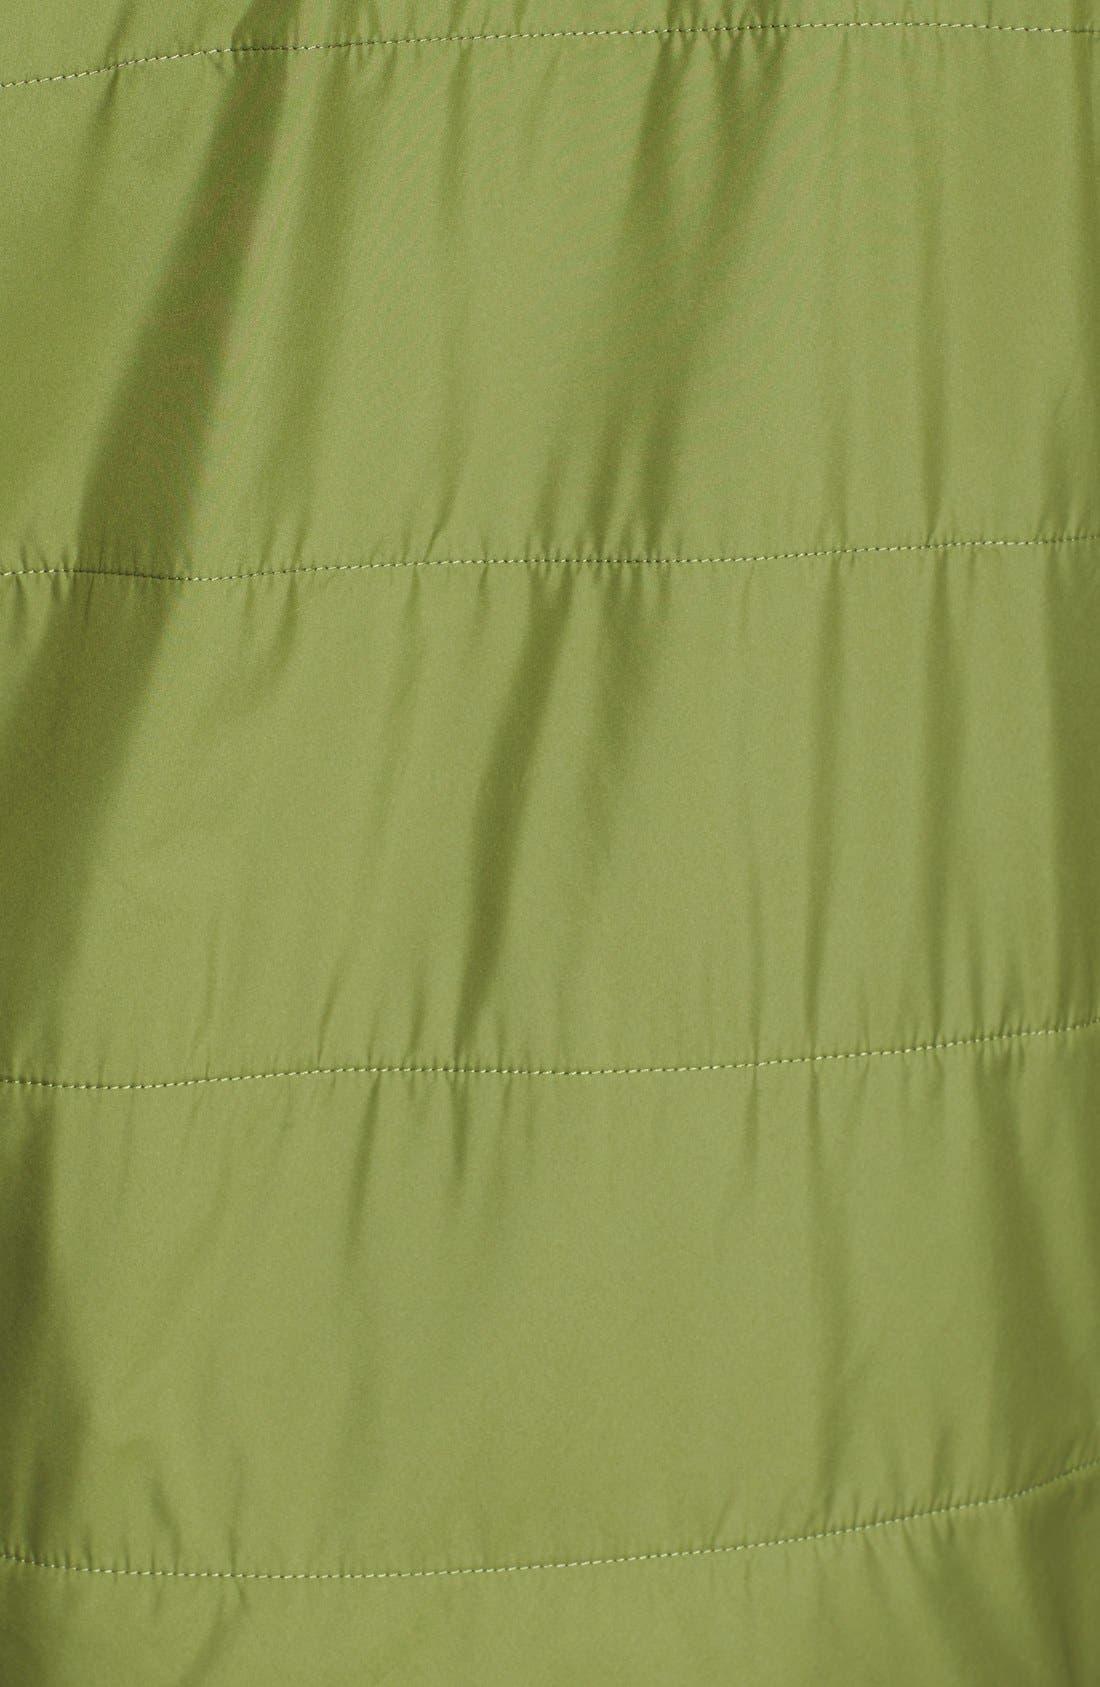 Alternate Image 3  - The North Face 'Meeks' Water Resistant Heatseeker Insulated Jacket